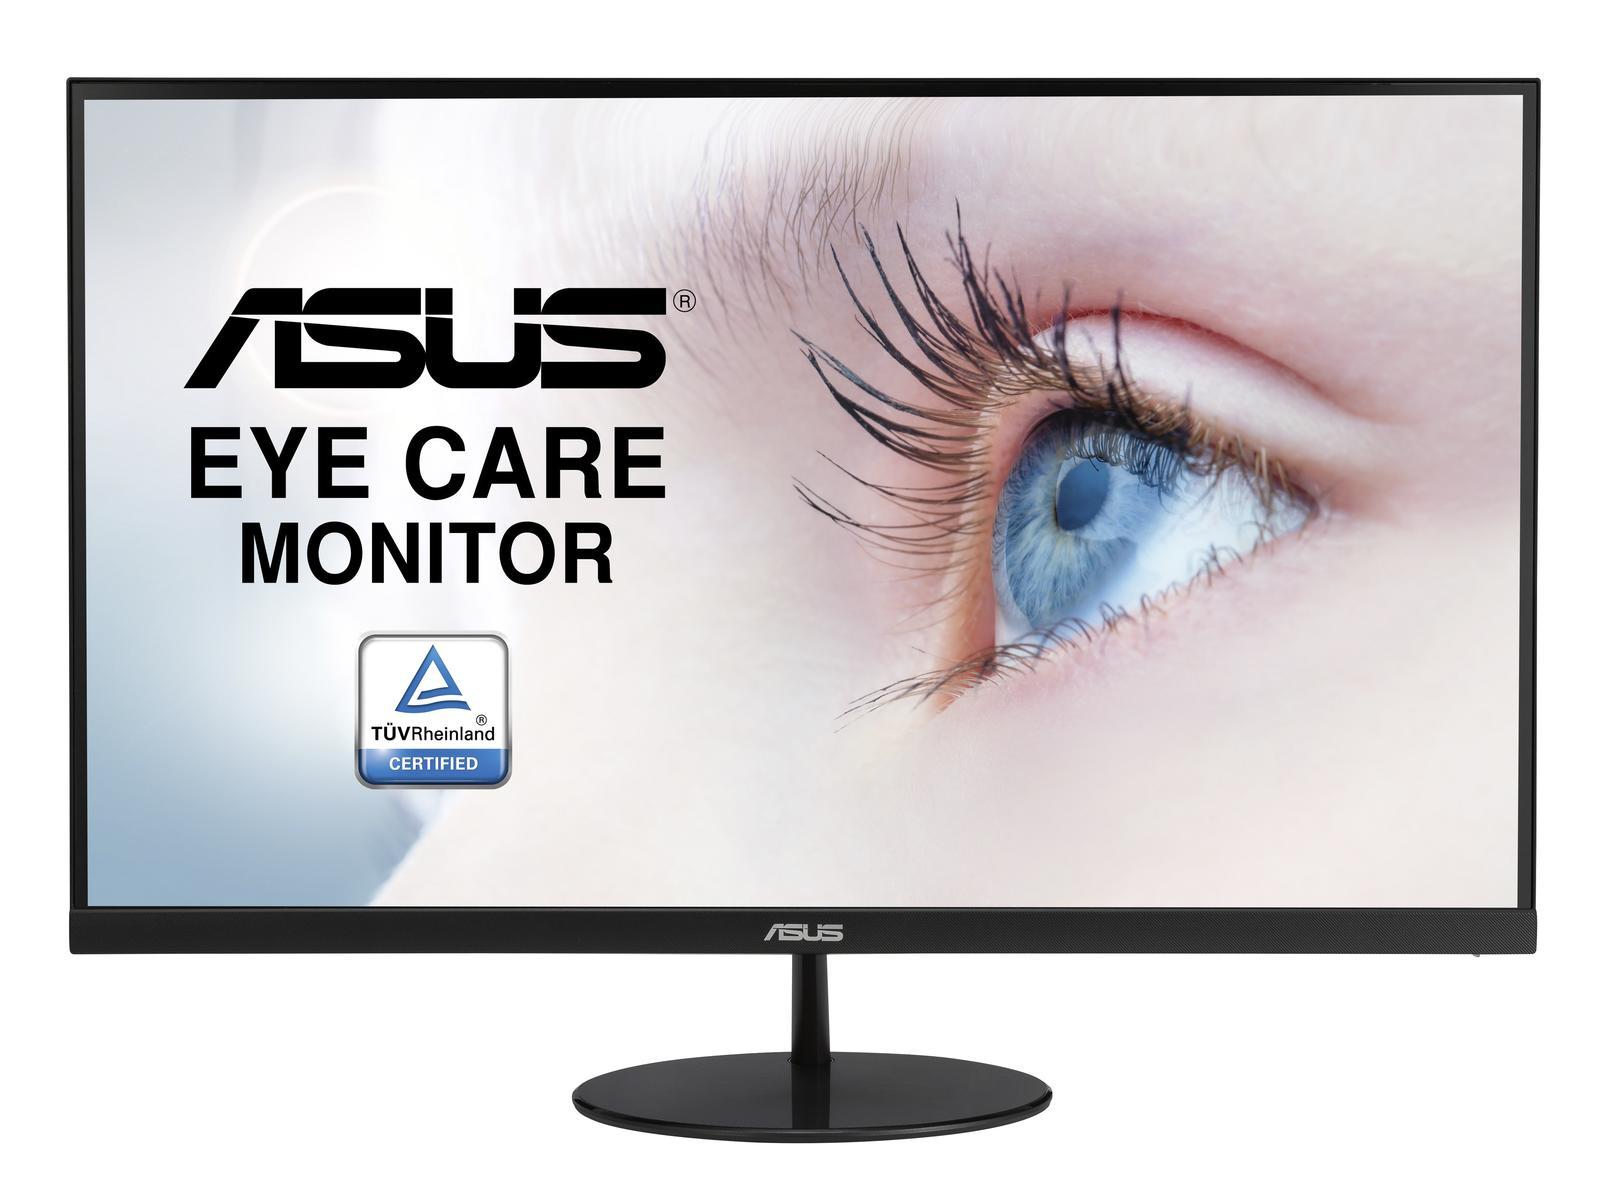 [OfficePartner] Asus VL278H Monitor 68,58cm (27 Zoll) Full HD, TN, 1ms, HDMI, VGA, Eye Care